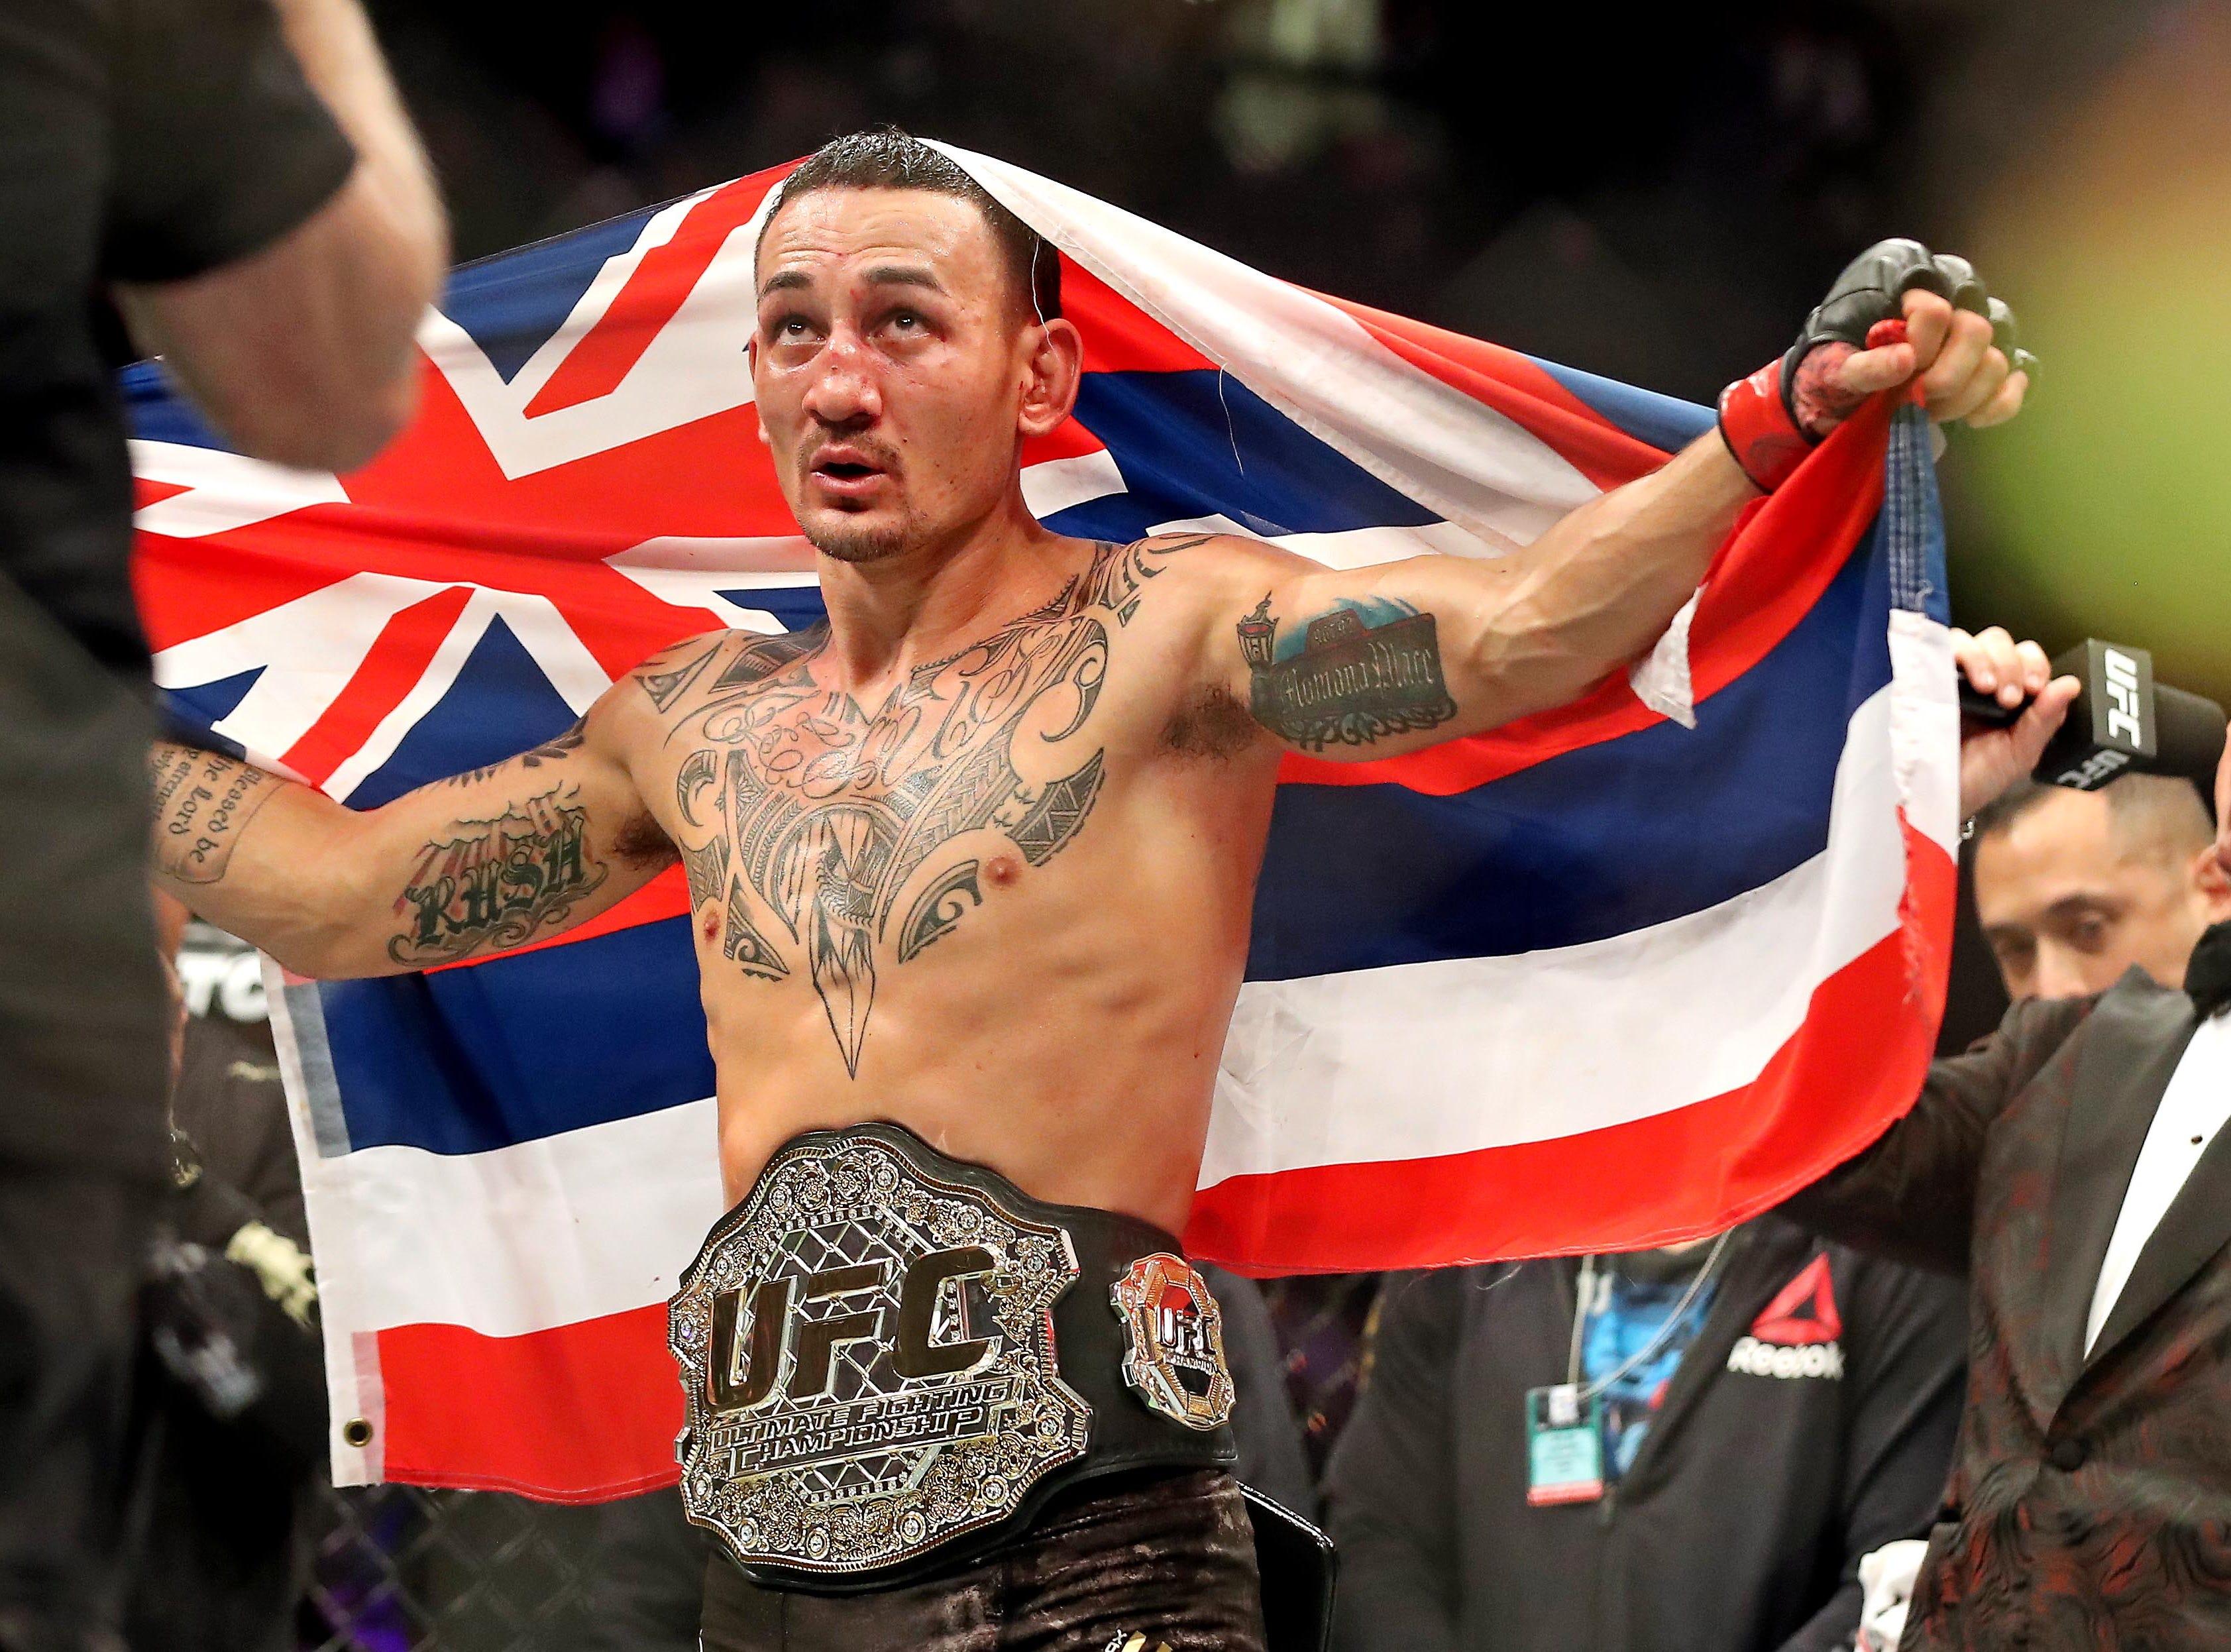 Max Holloway celebrates after beating Brian Ortega during UFC 231 at Scotiabank Arena.